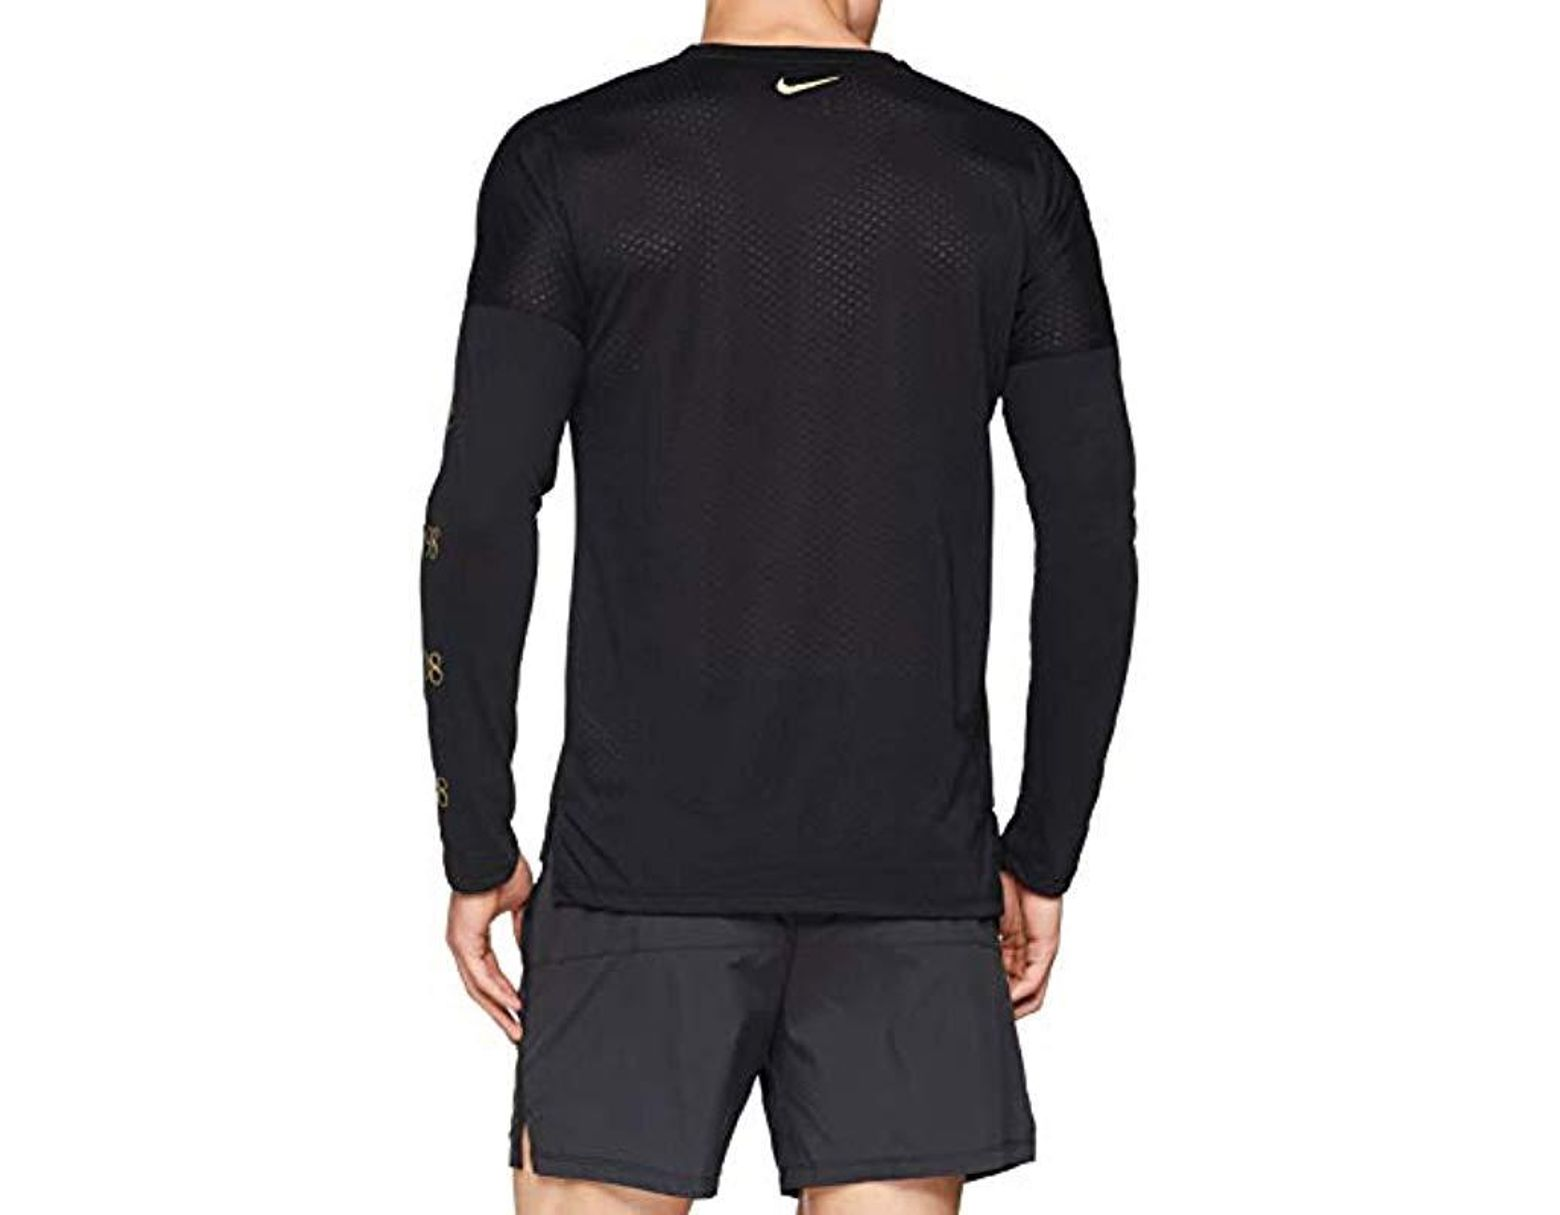 80817c51 Men's Black 's M Nk Tailwind Top Ls Gx Long Sleeve